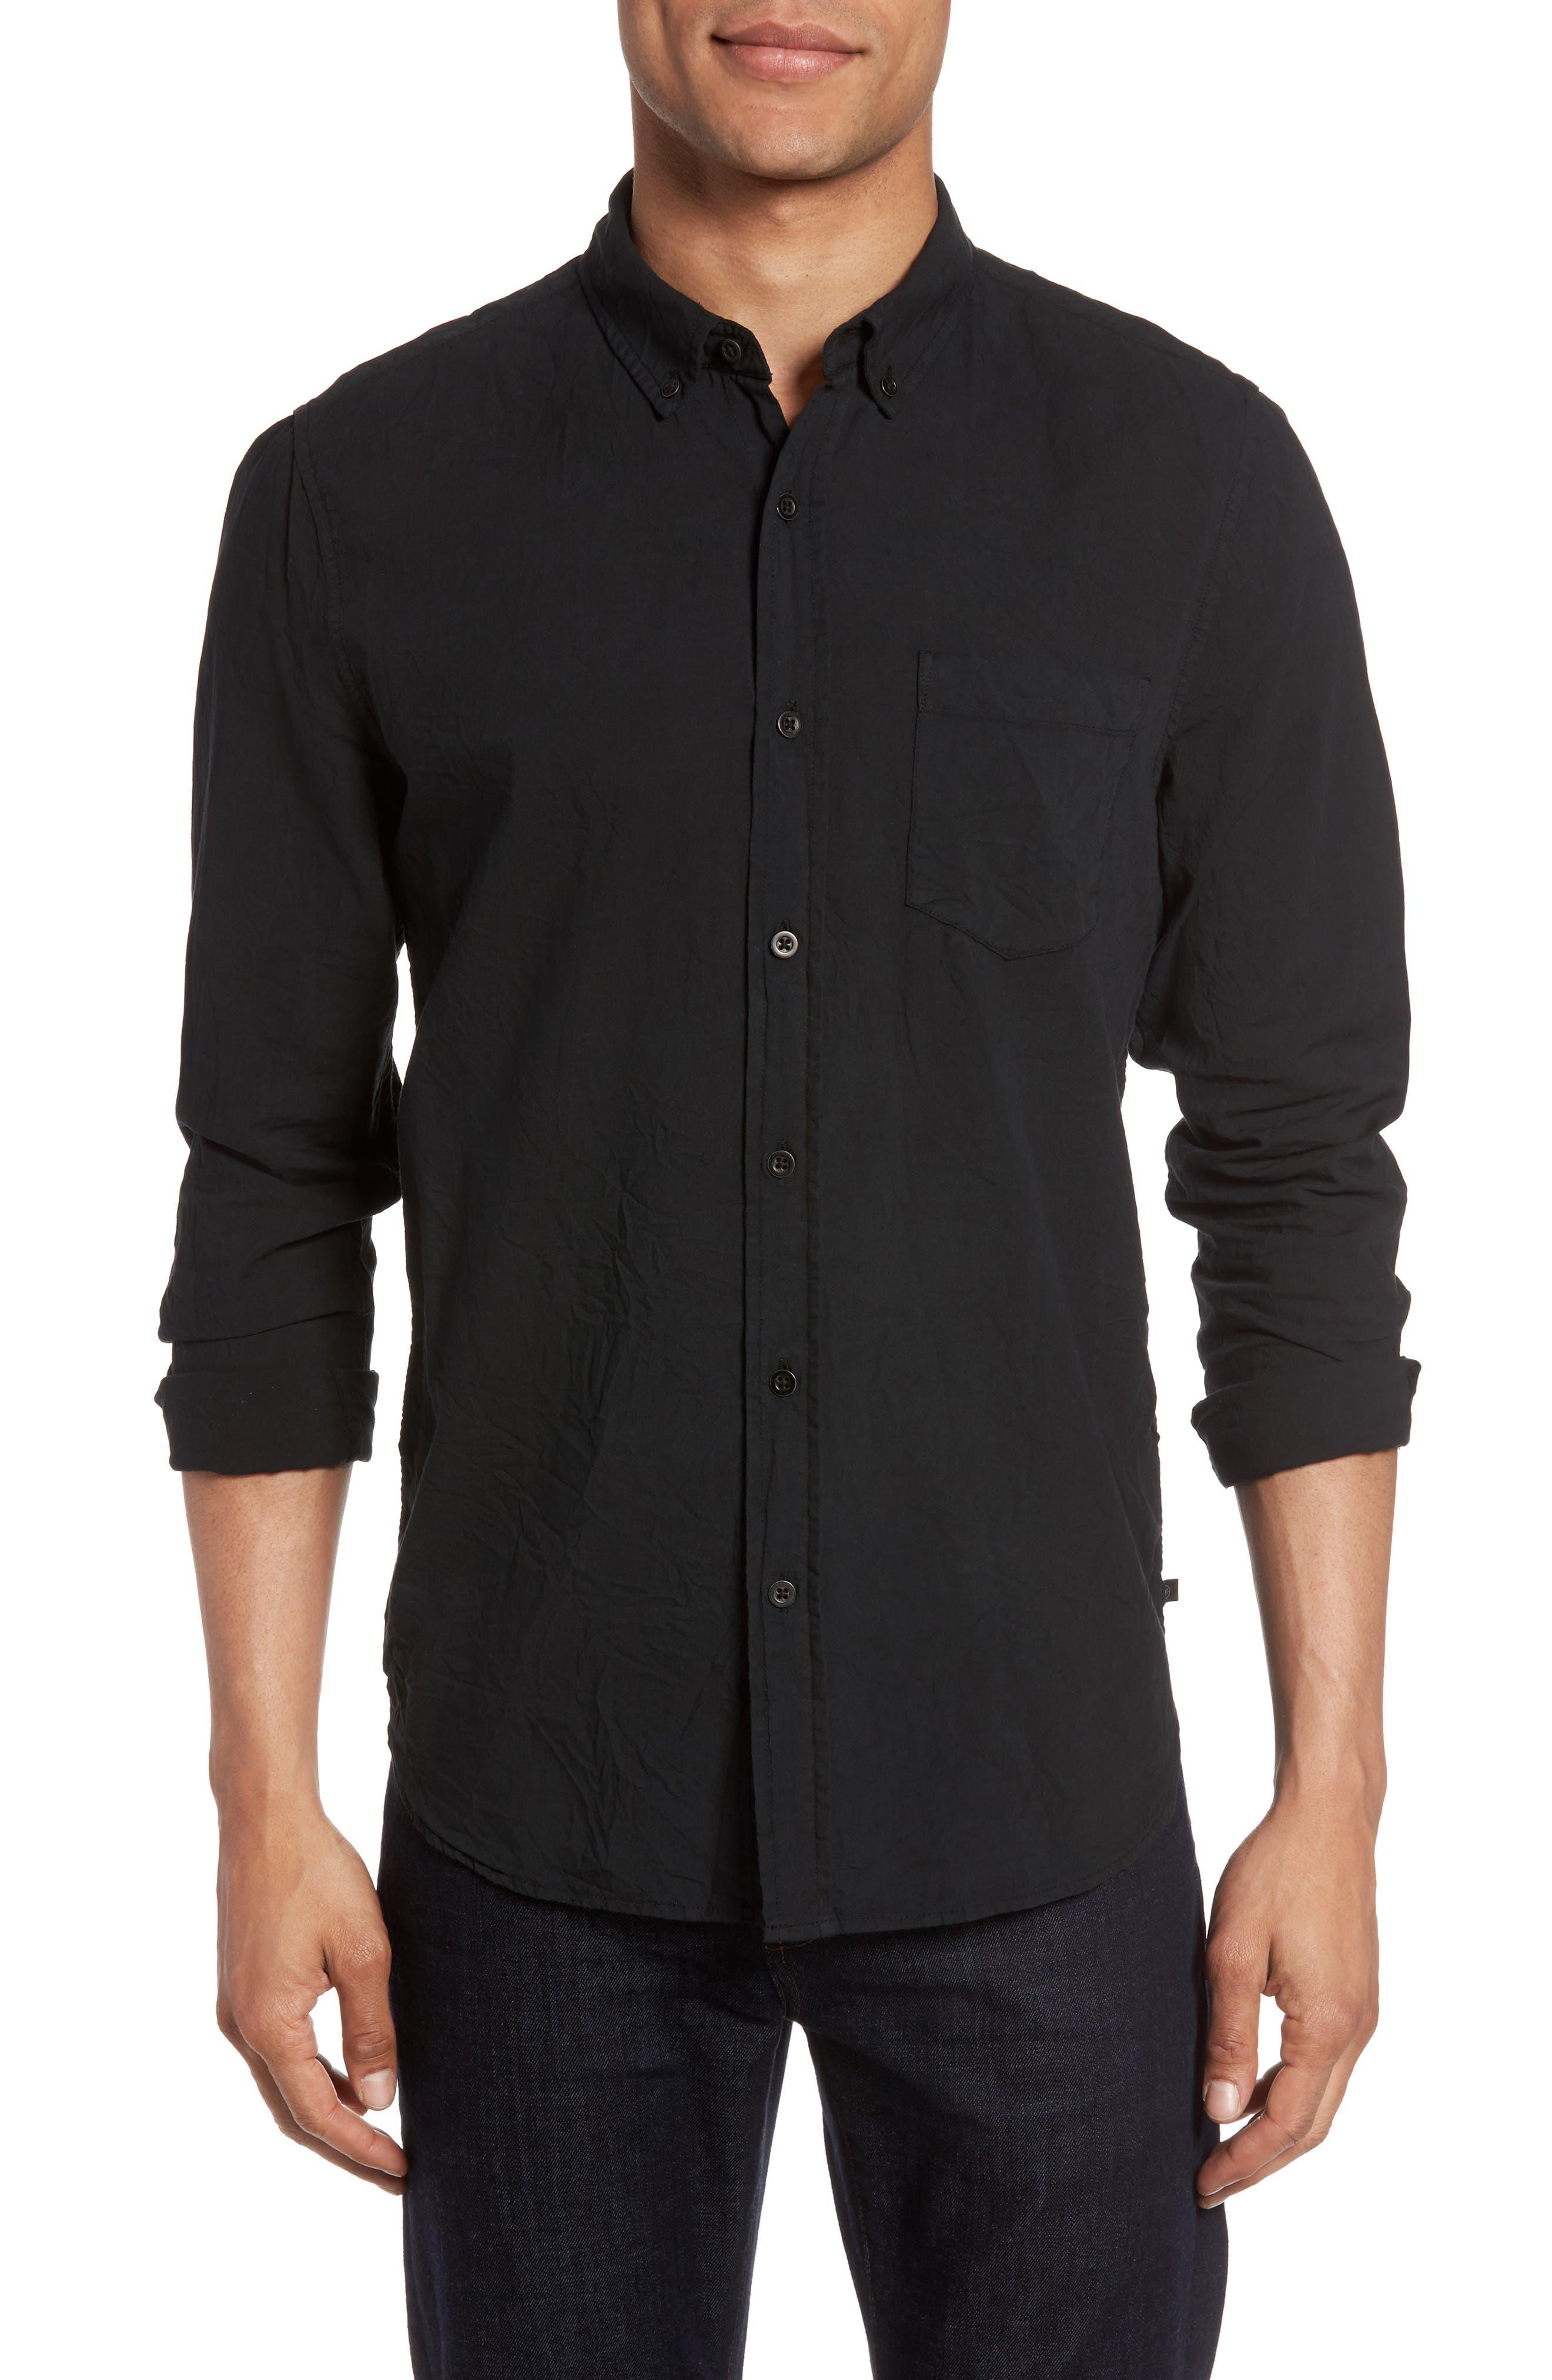 AG Grady Slim Fit Organic Cotton Sport Shirt